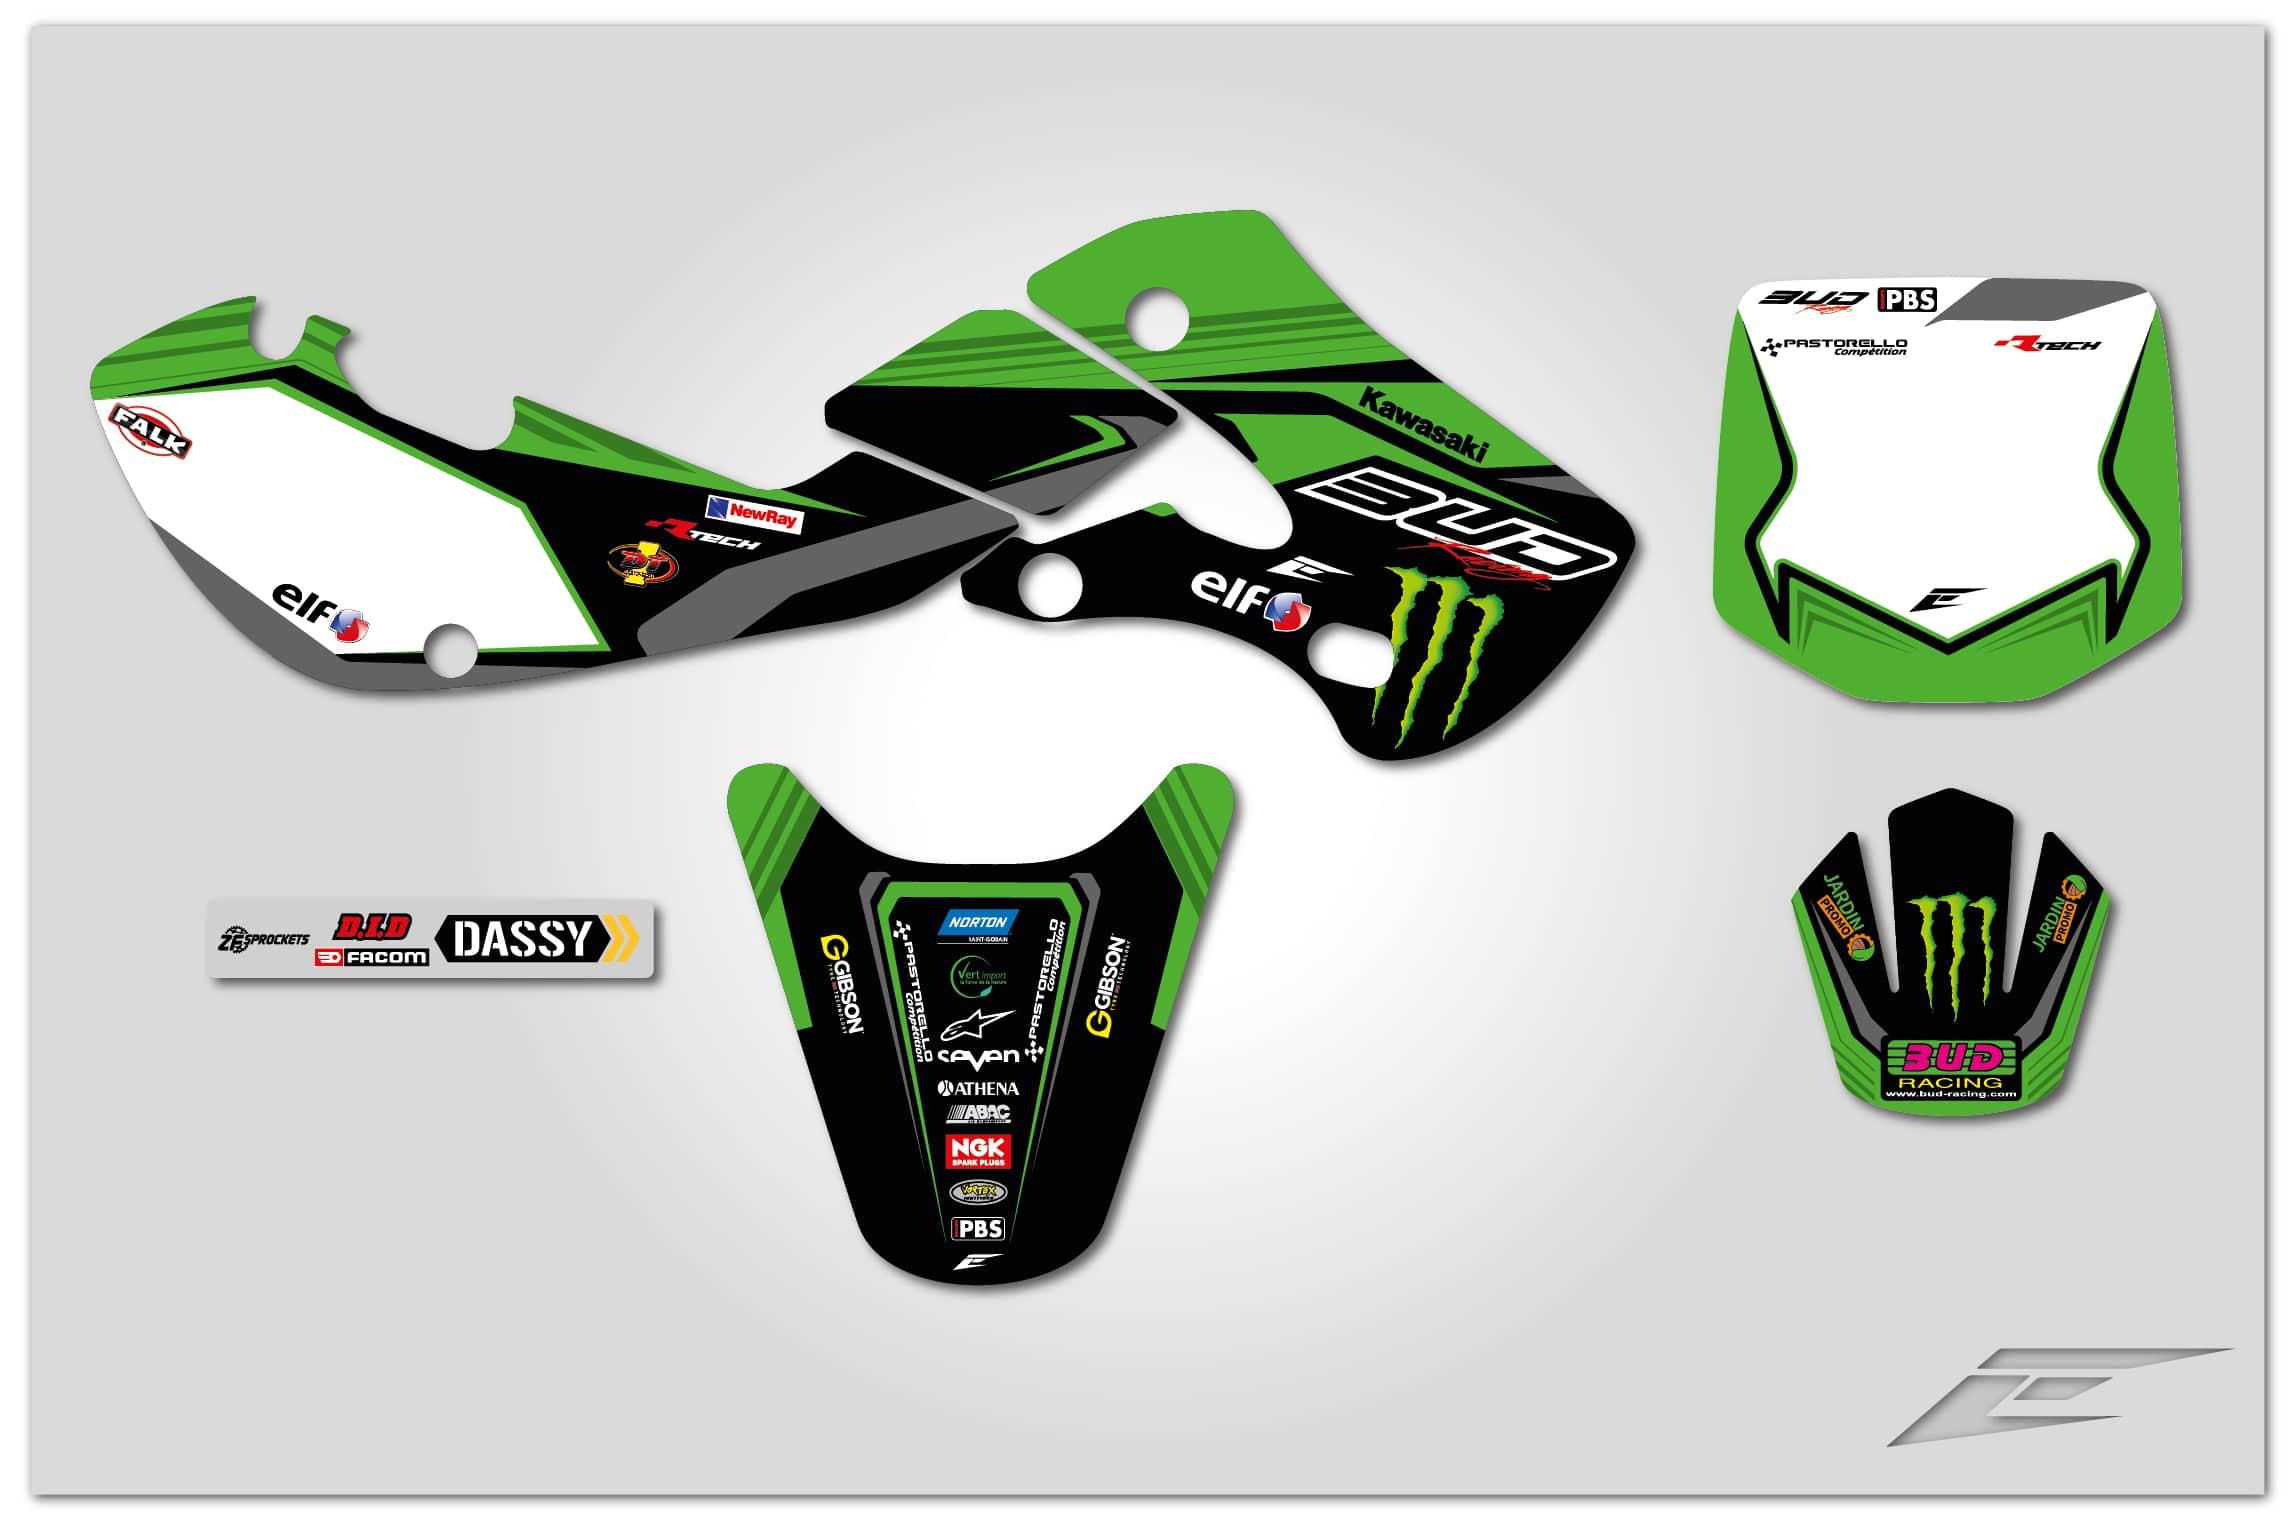 Kit déco team BUD racing 2018 réplica Kawasaki 65 KX